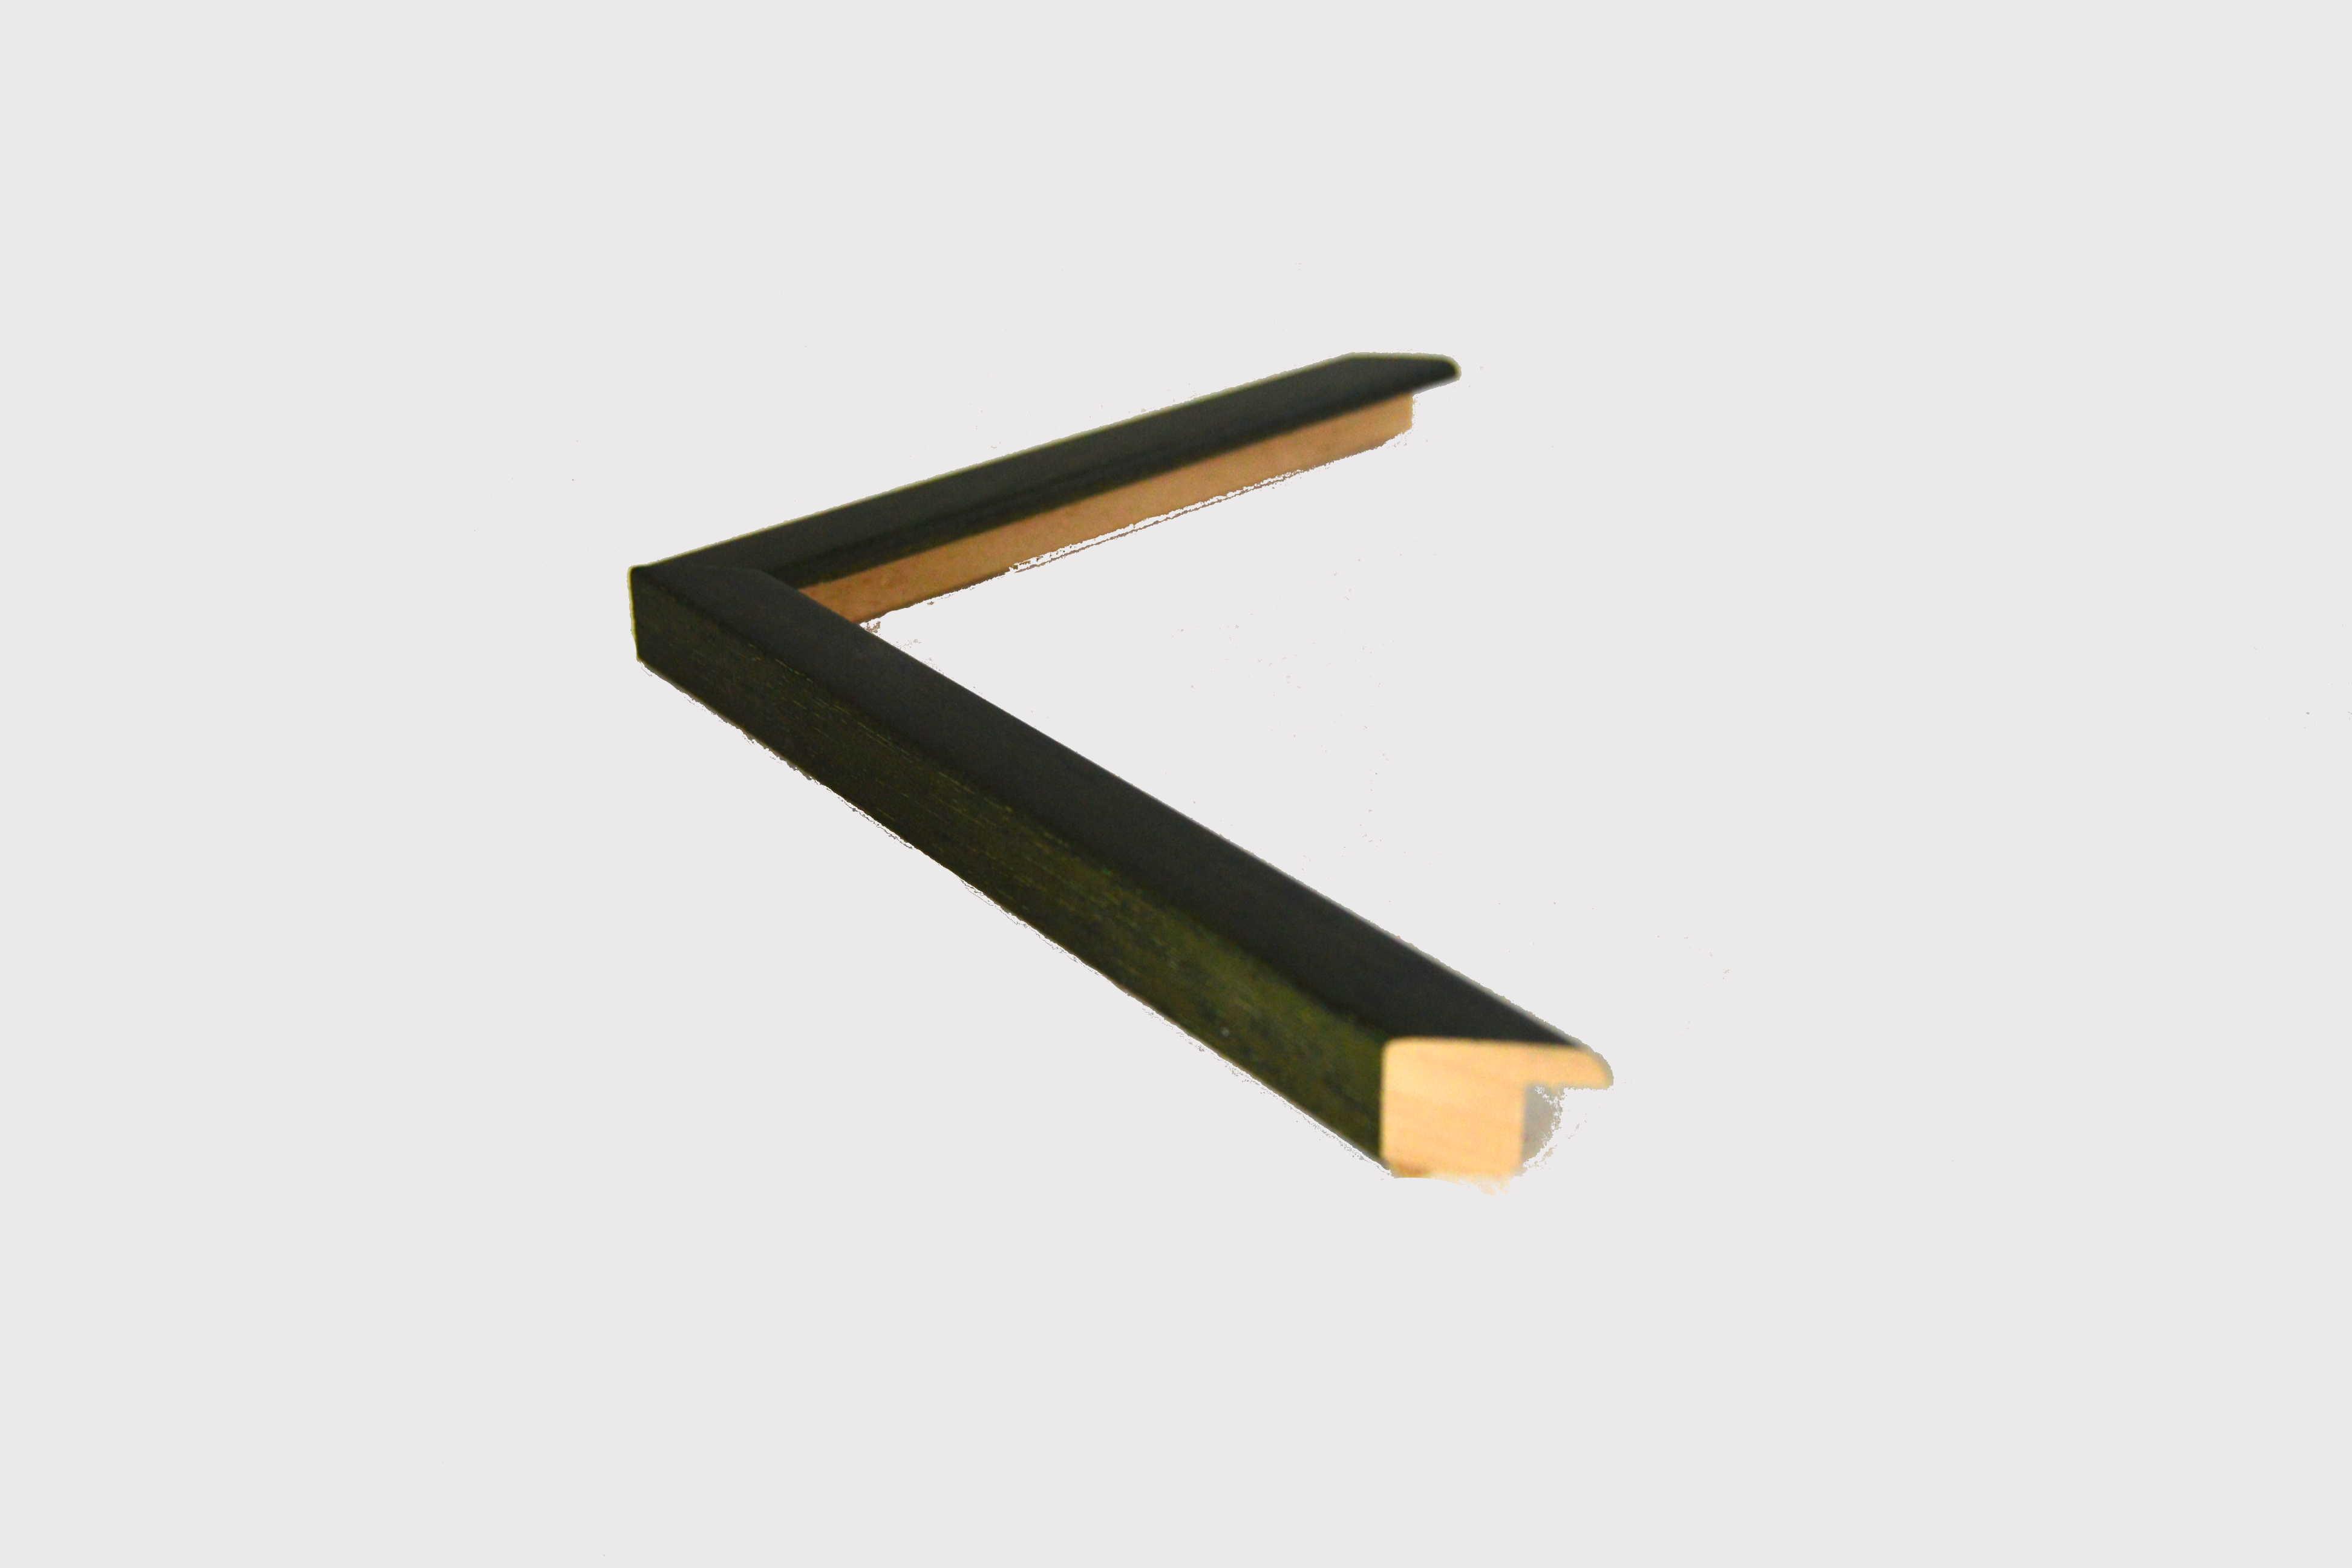 00290-800-VERDE-ancho1.8cm-perfil